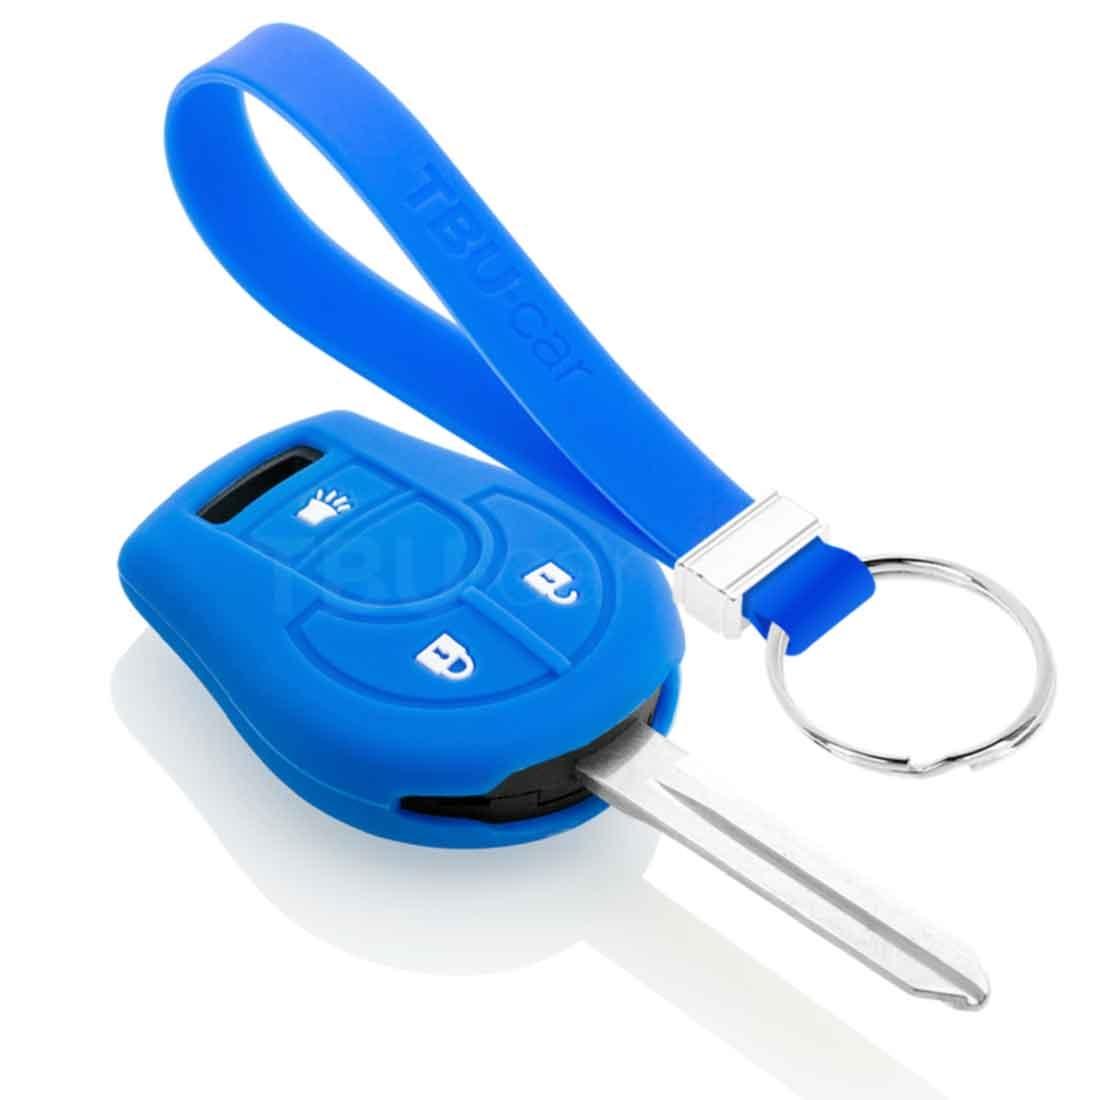 TBU car TBU car Autoschlüssel Hülle kompatibel mit Nissan 3 Tasten - Schutzhülle aus Silikon - Auto Schlüsselhülle Cover in Blau